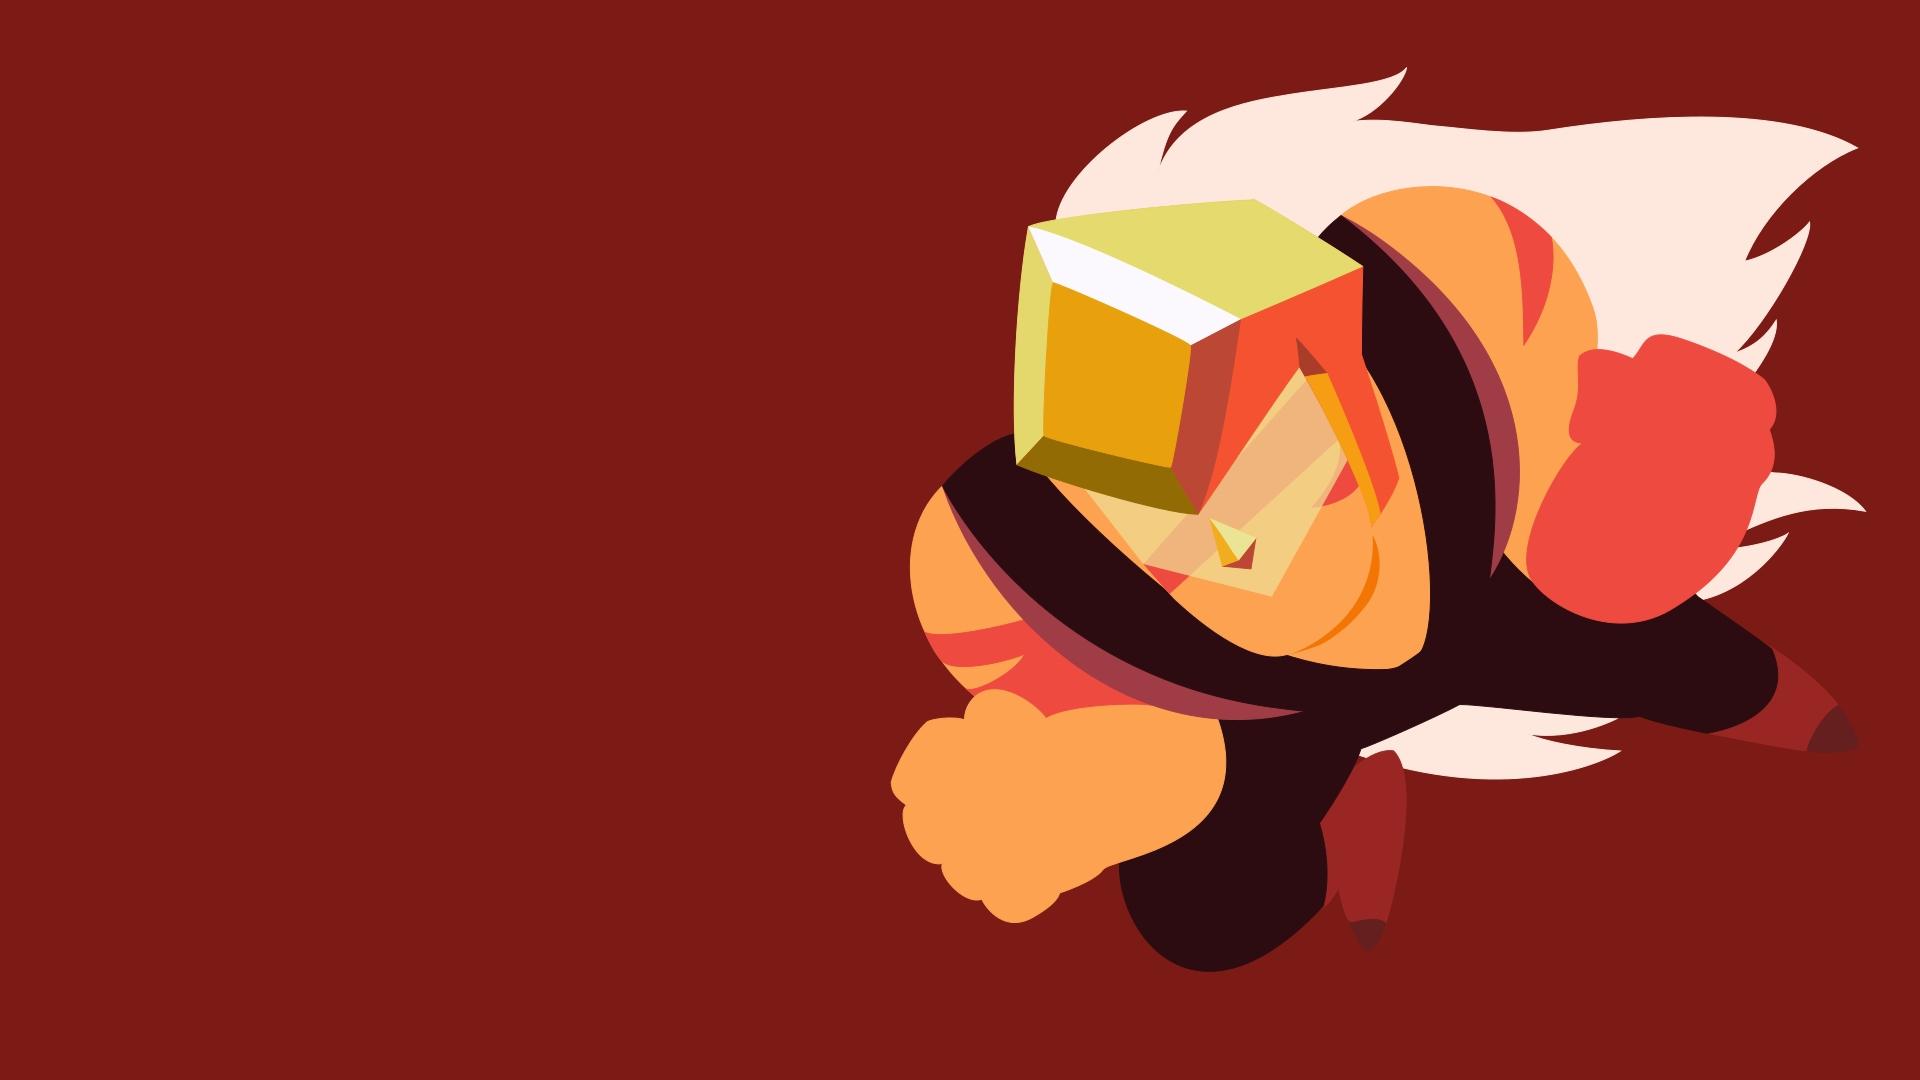 Steven Universe Vector Wallpaper Image